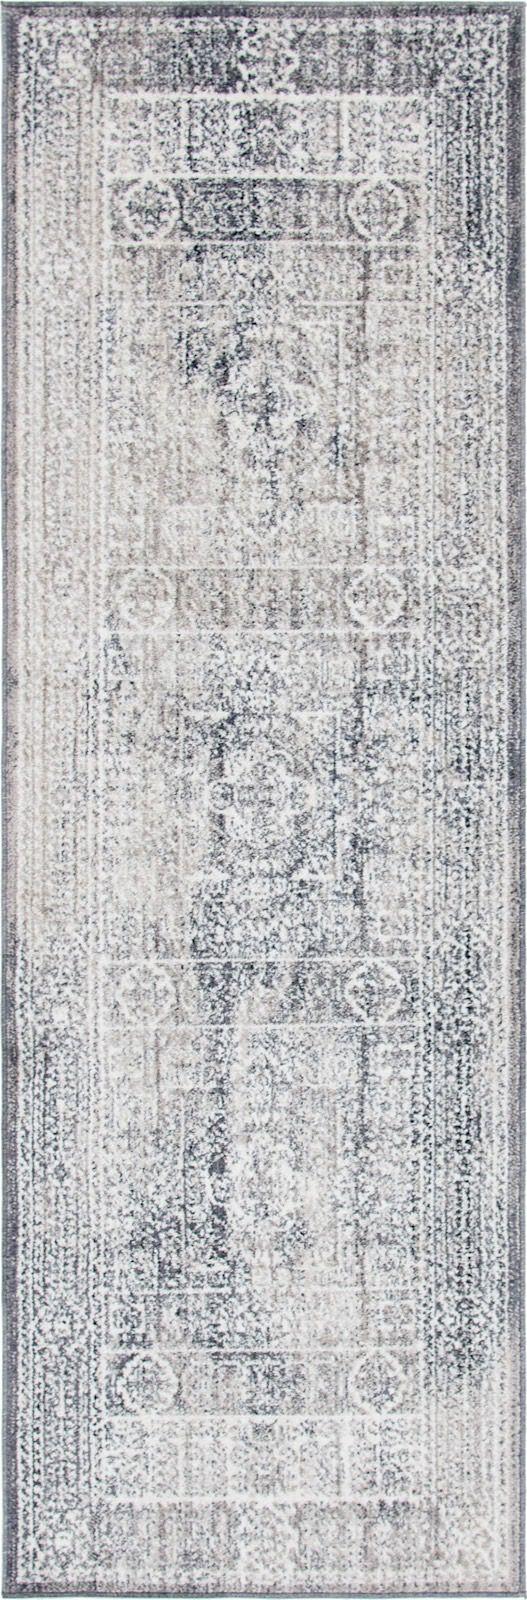 kingston traditional area rug collection